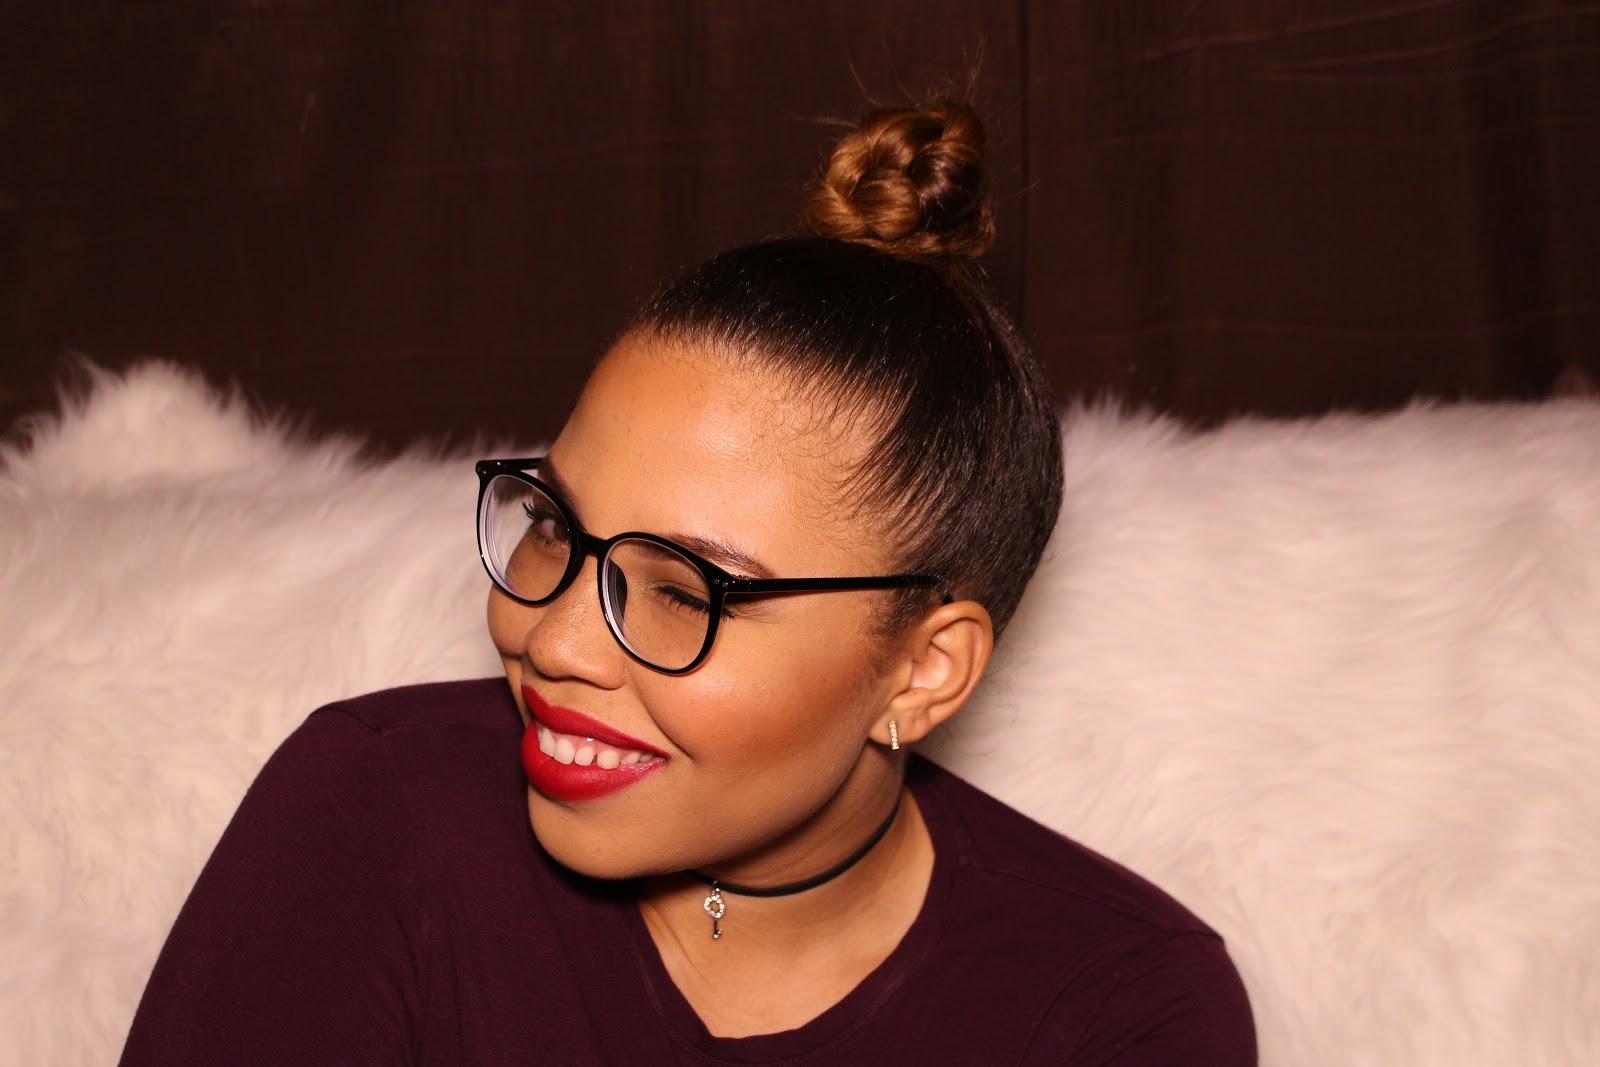 most popular eyeglasses l96k  the most popular online eyeglasses store Years of expertise in optical  industry enable Firmoocom to offer varieties of prescription eyewear to  the